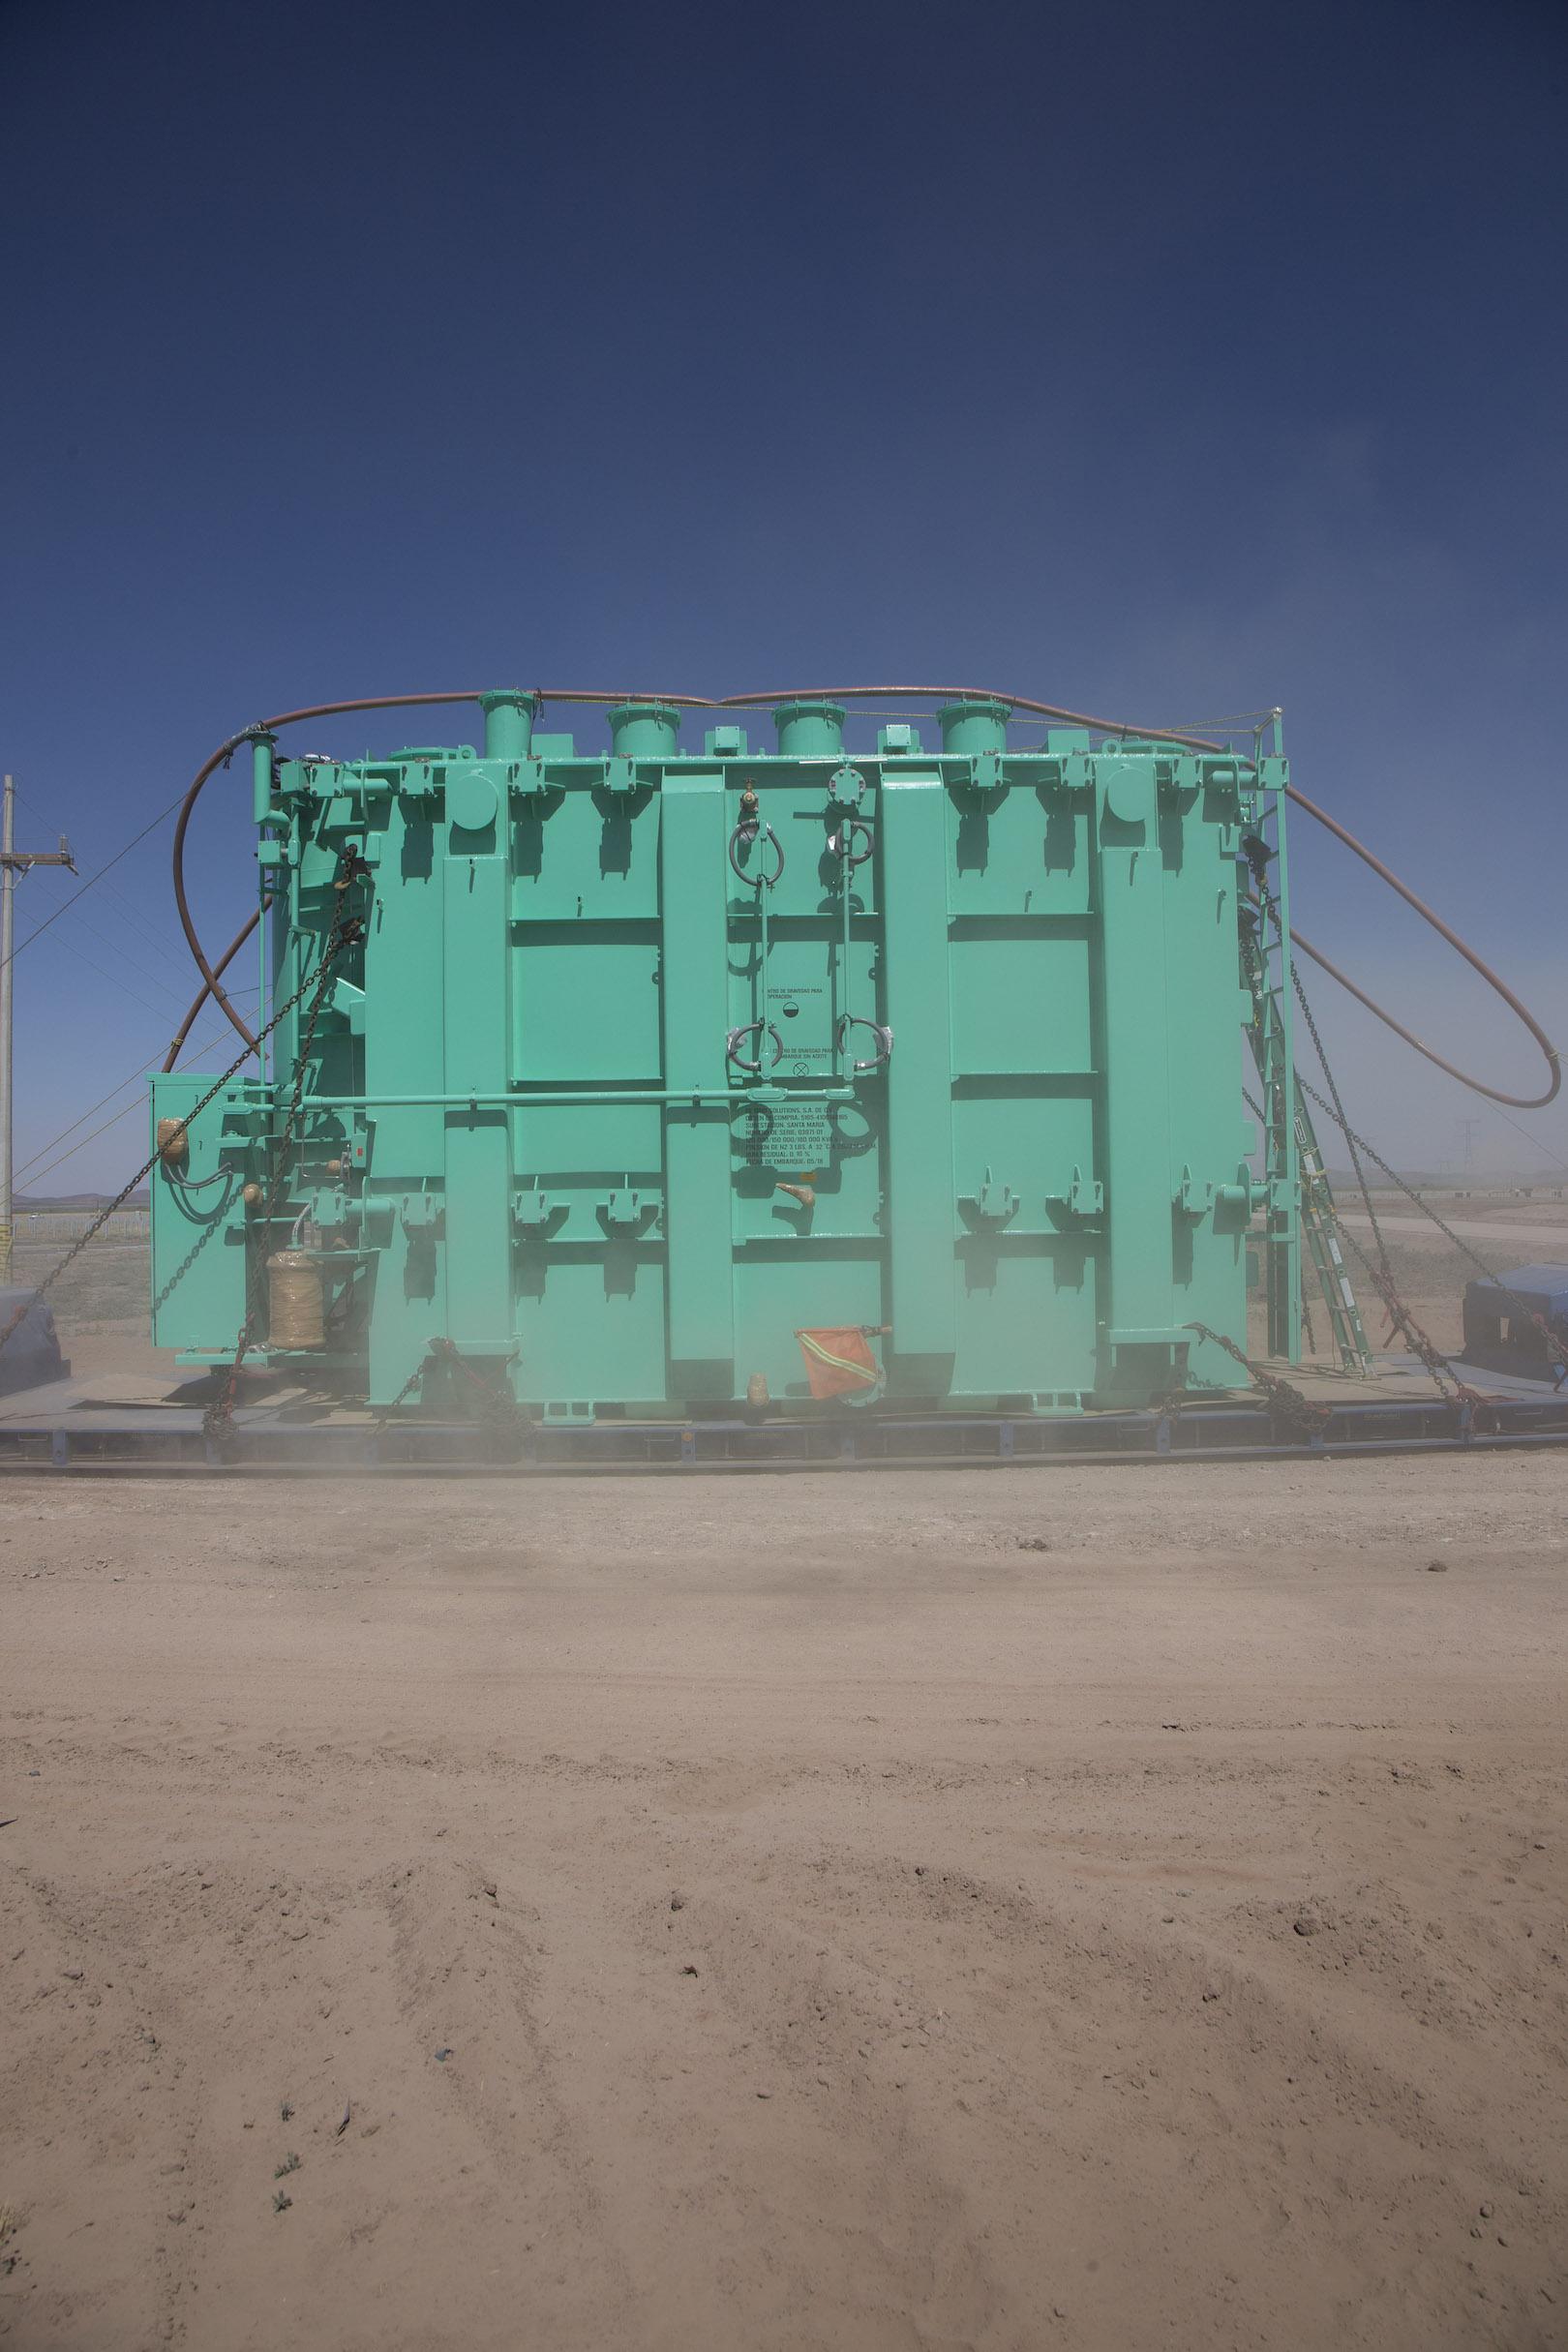 Zuma Energía receives $300m to build two solar farms in Mexico - Power Technology (27.11.17)